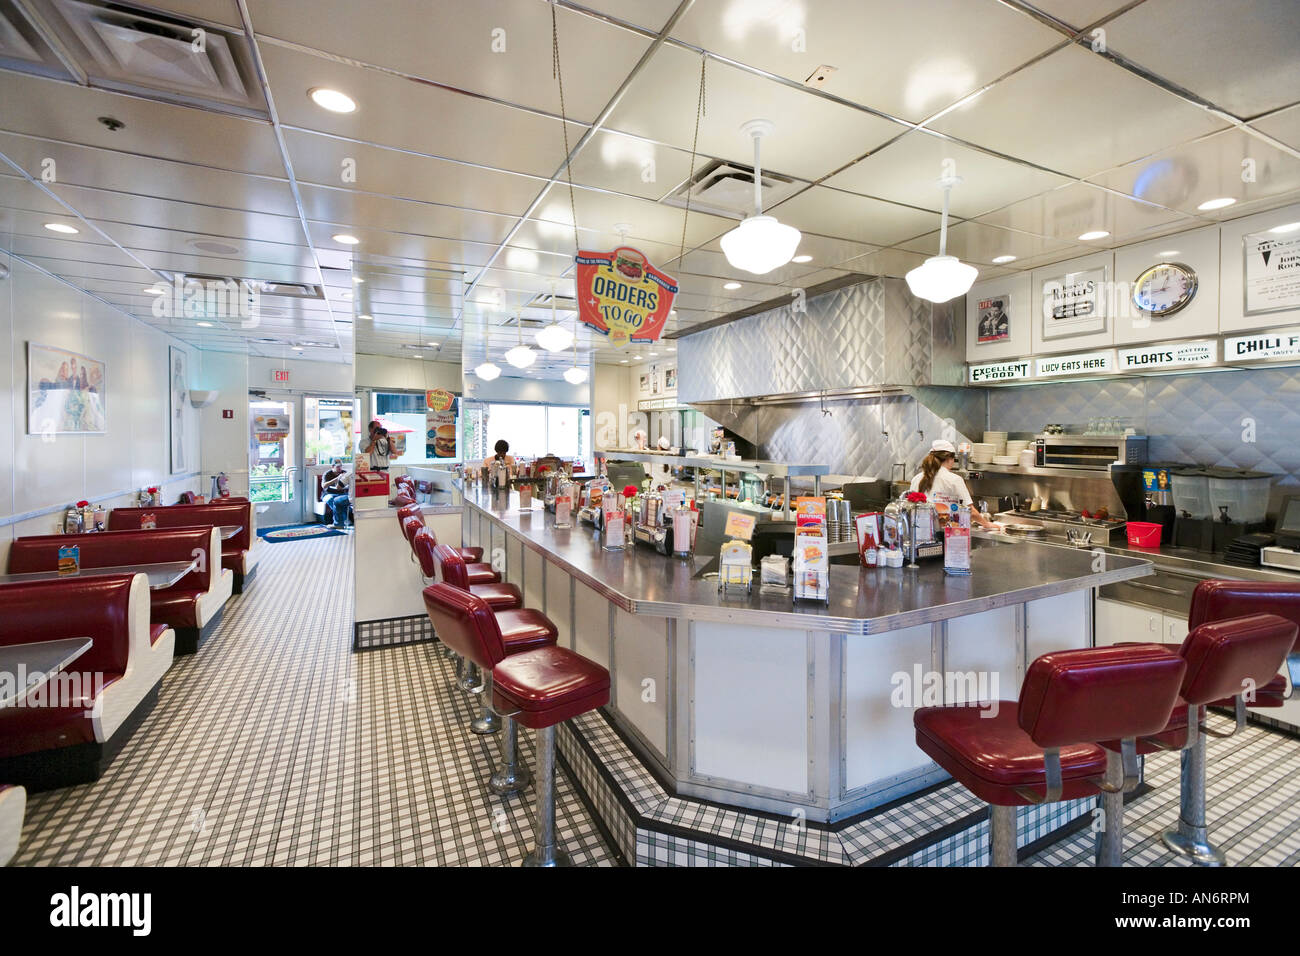 Johnny Rockets Retro Style Hamburger Restaurant, Pointe Orlando, International Drive, Orlando, Florida, USA - Stock Image